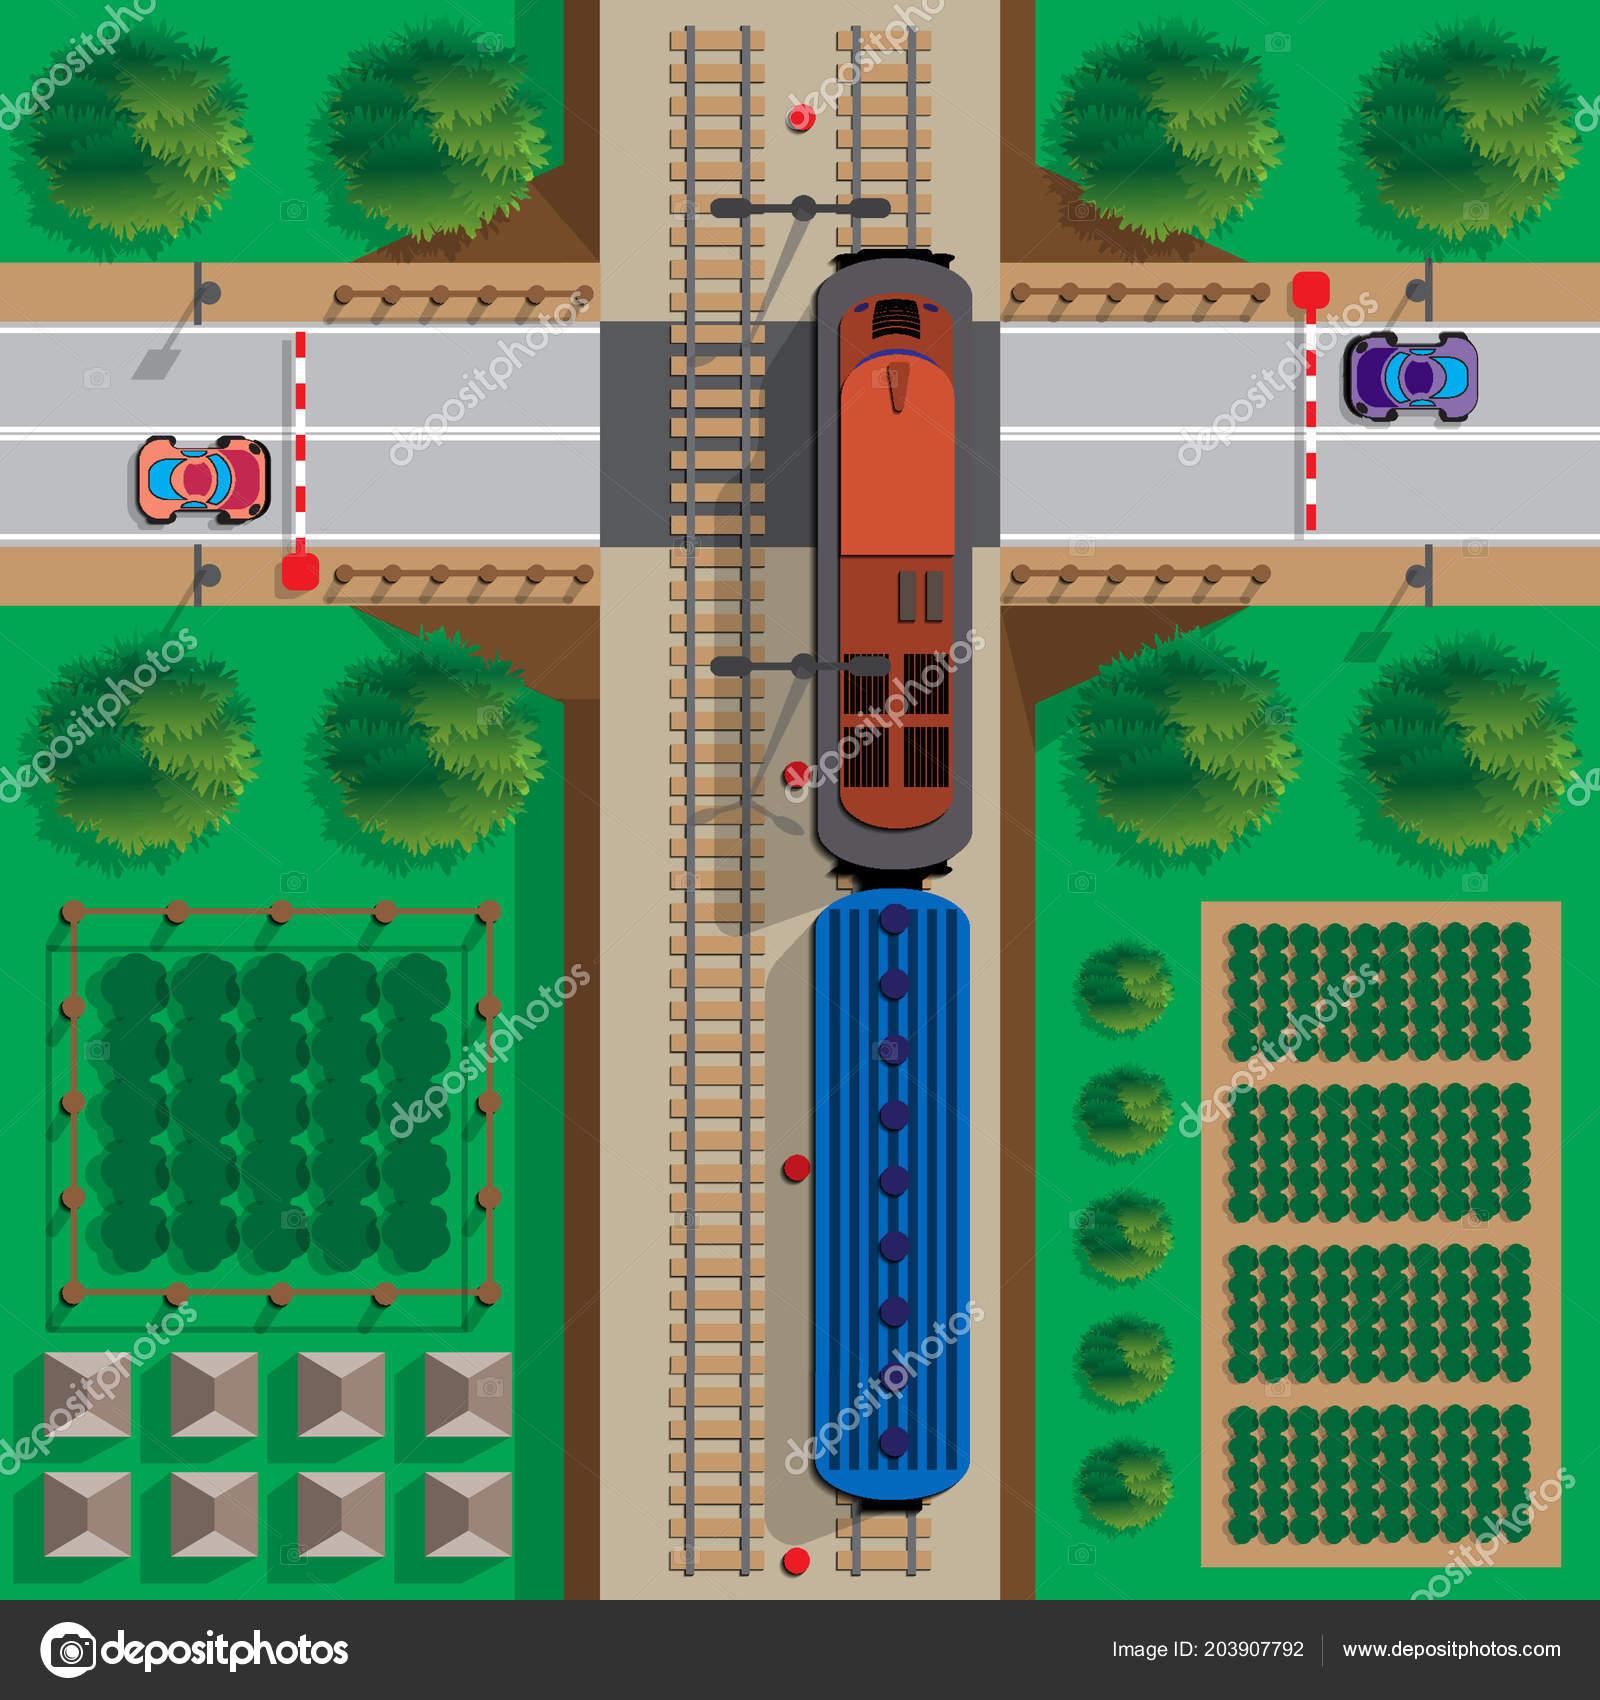 railroad crossing games download